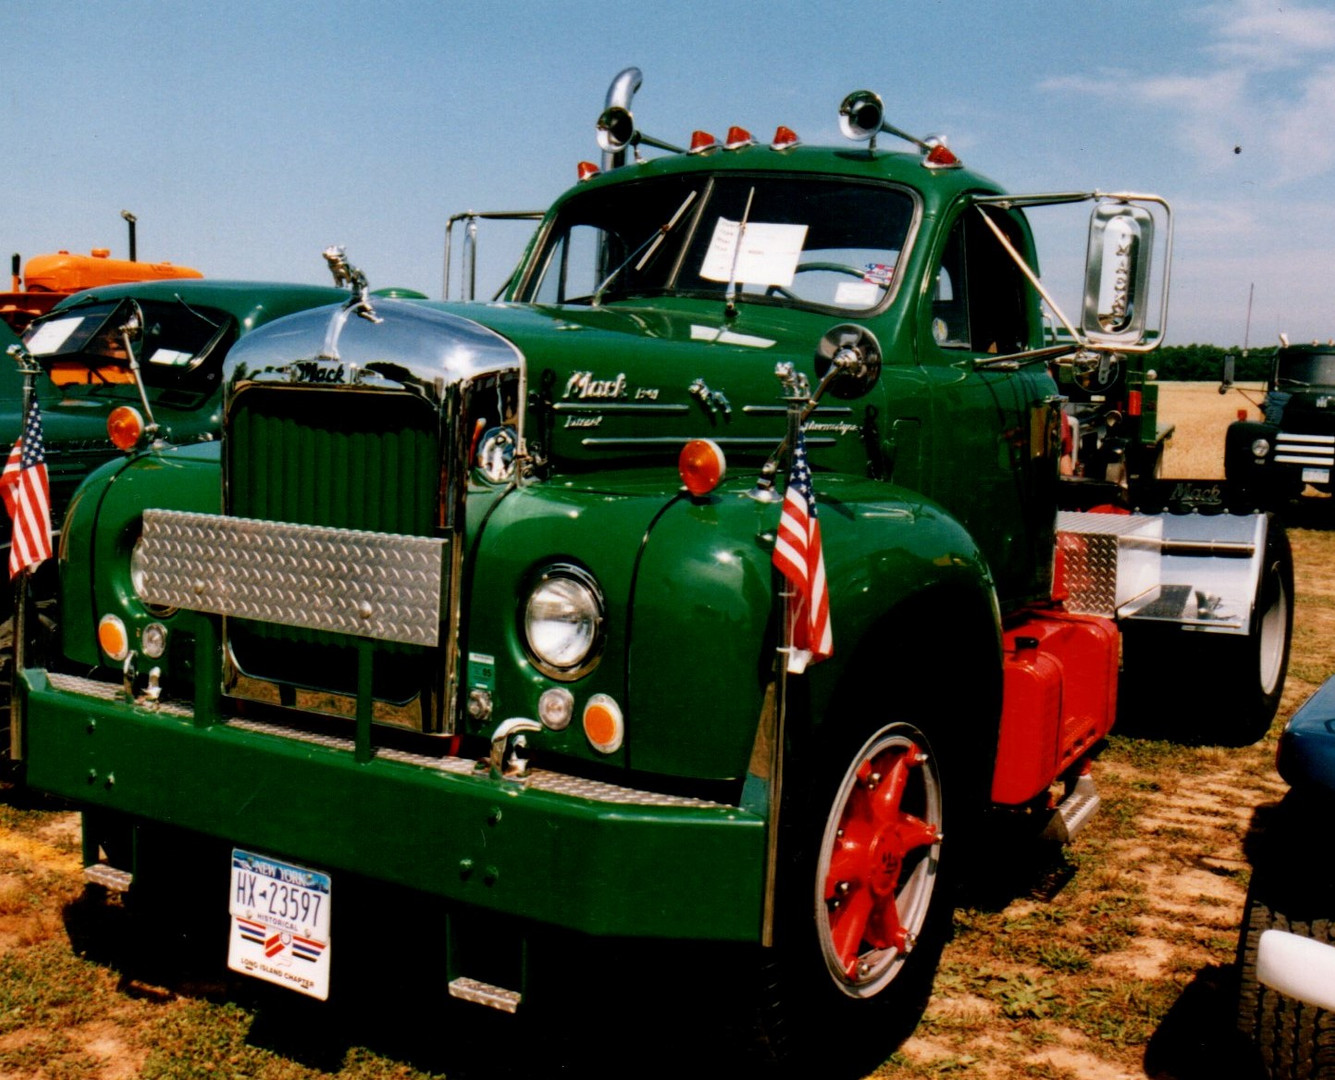 1965 Mack B-61 tractor - Nick Nuzzi